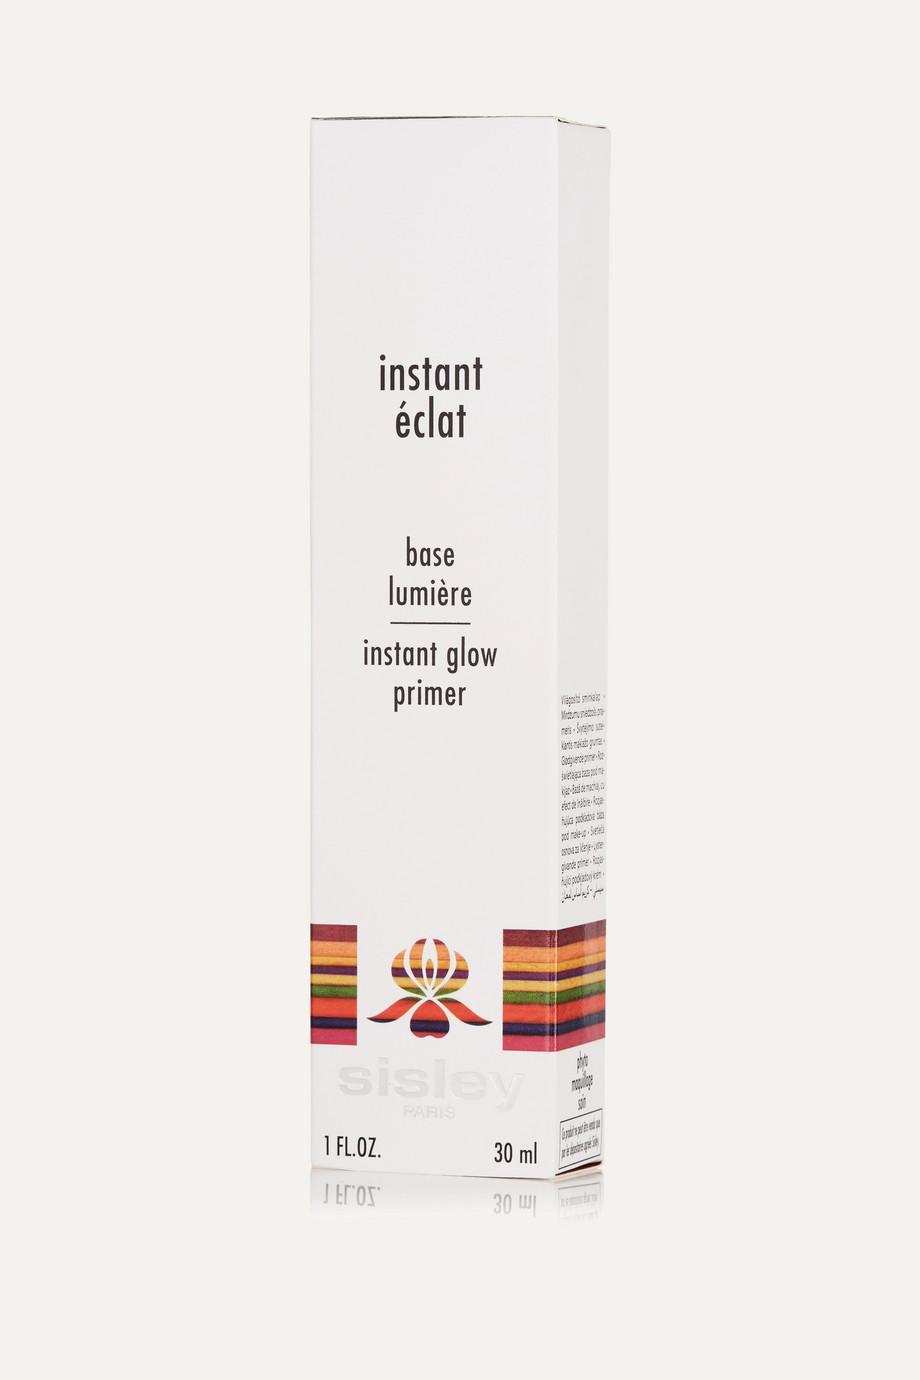 Sisley Instant Eclat, 30ml